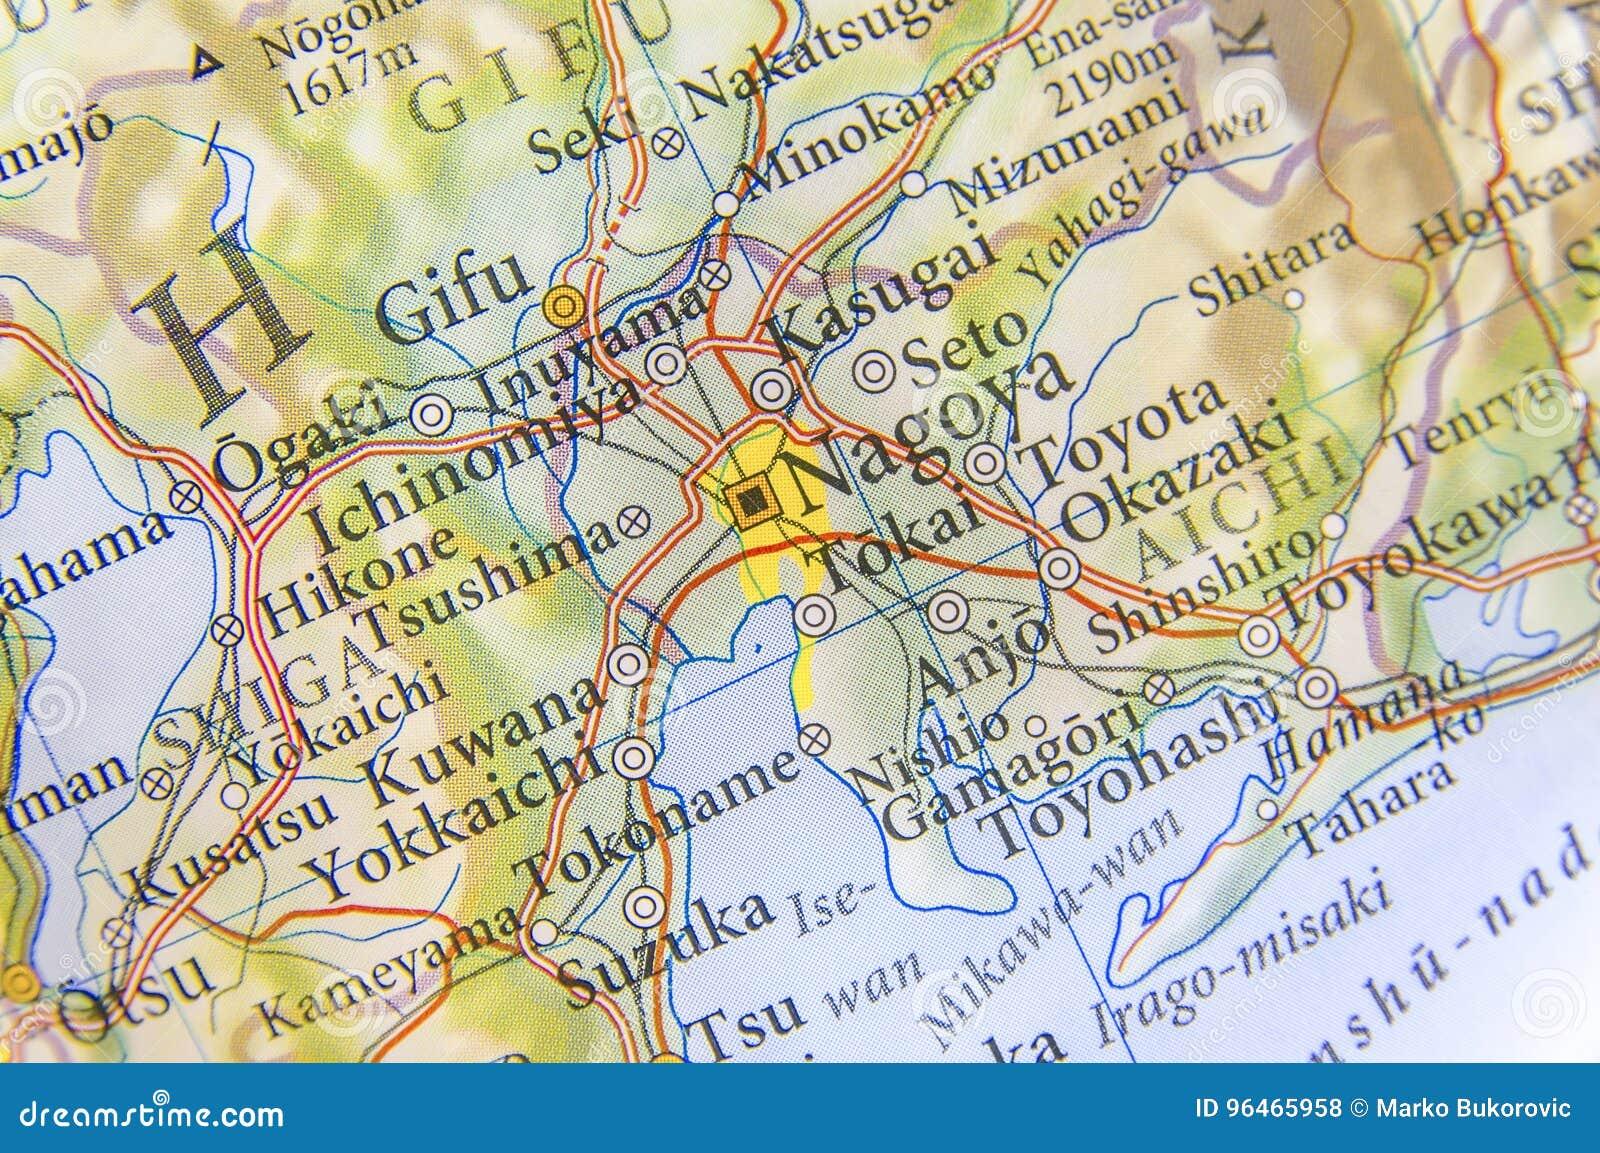 Geographic Map Of Japan City Nagoya Stock Photo - Image of tourism ...